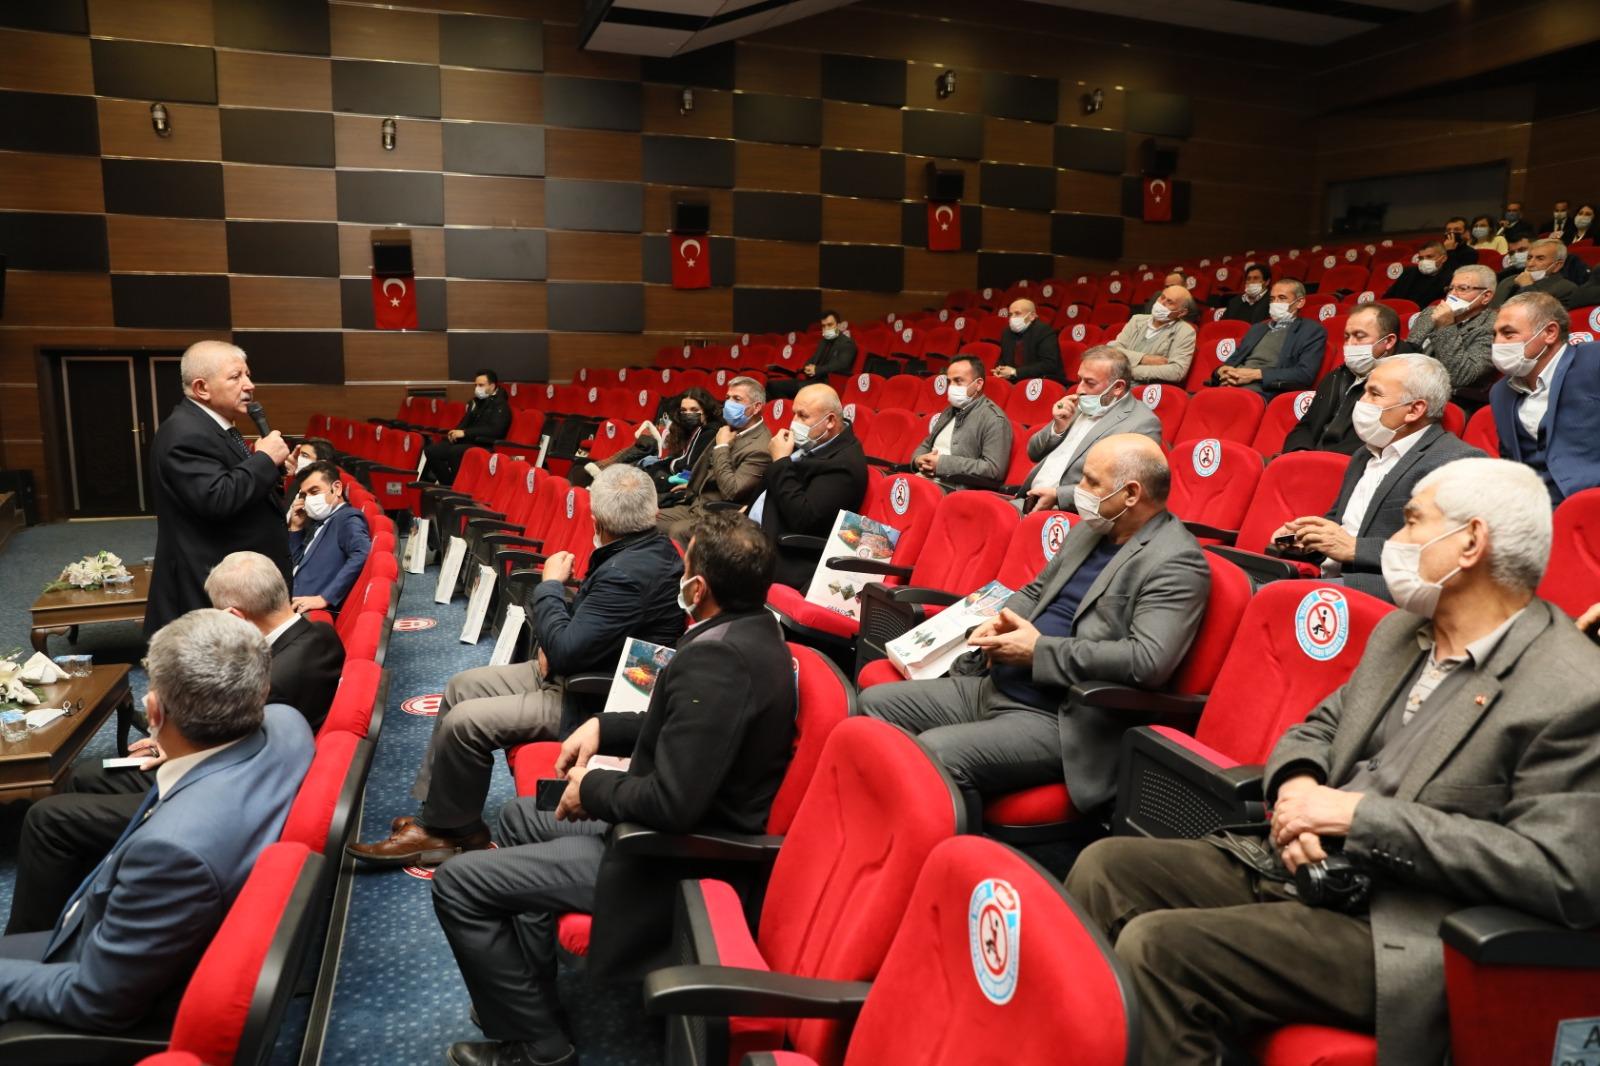 Amasya'da Muhtarlarla Gastranomi Toplantısı